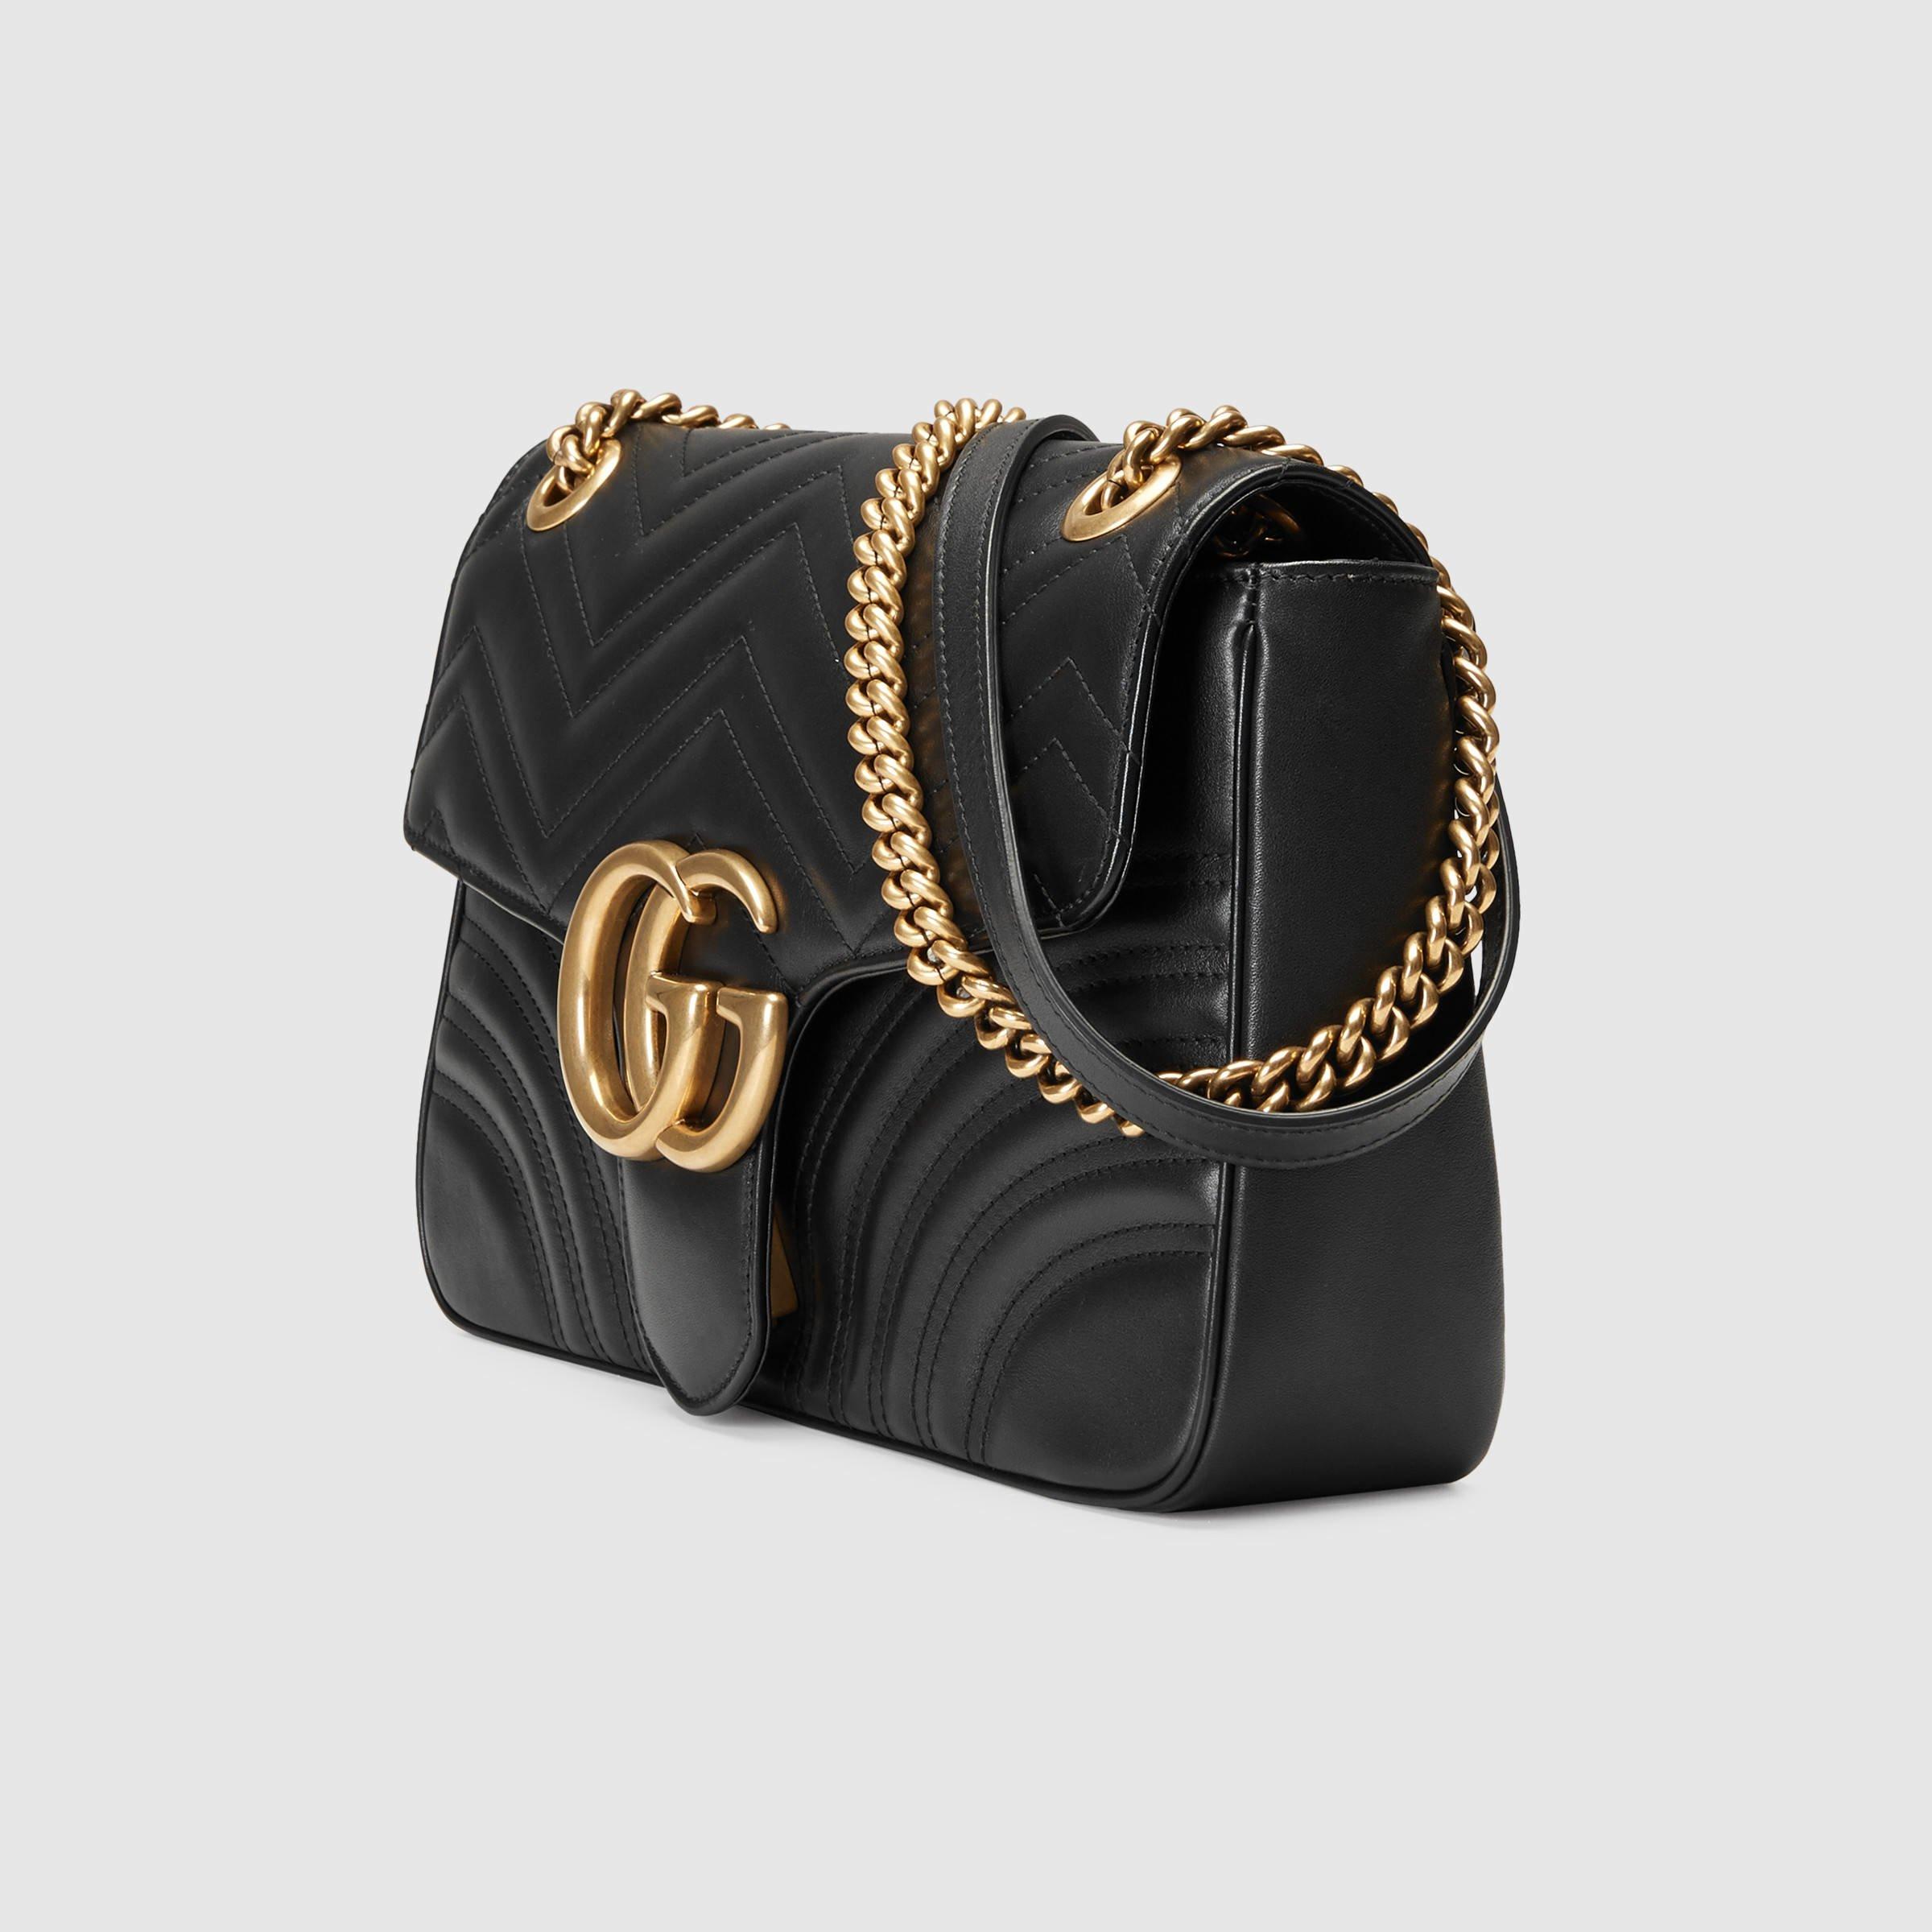 Gucci Black Leather Web Stripe Small Shoulder Bag In Black